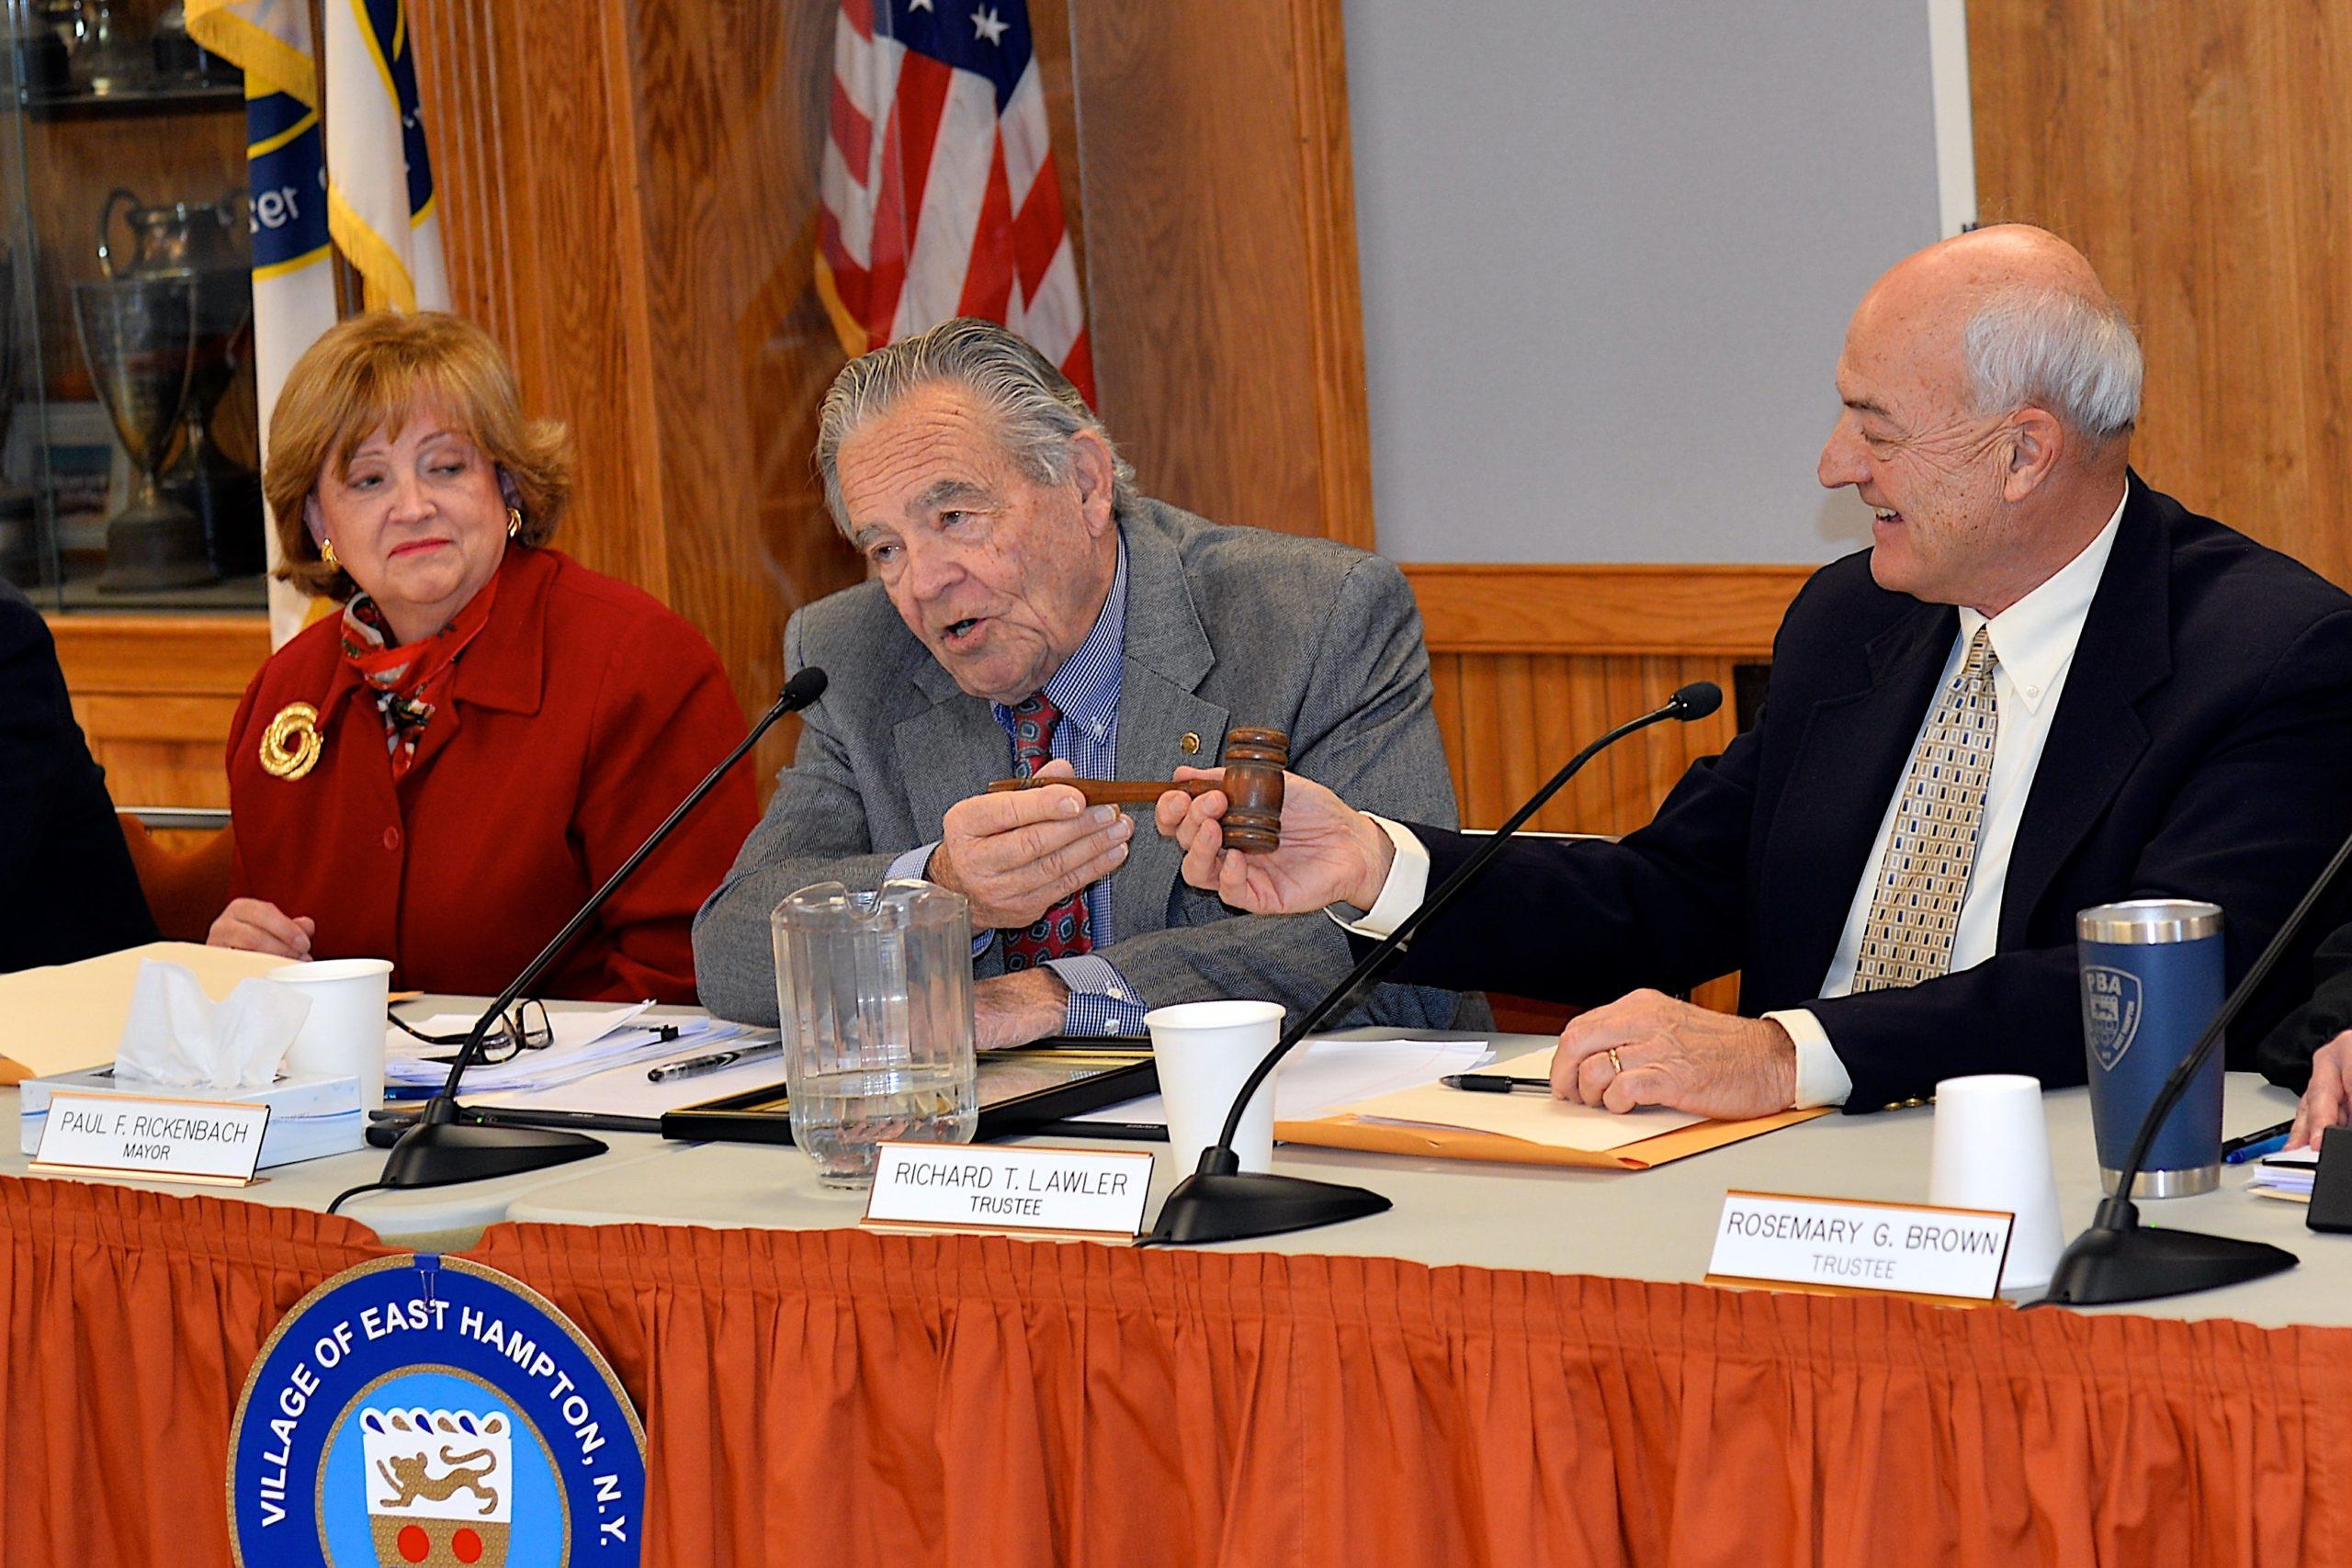 East Hampton Mayor Paul F. Rickenbach Jr. hands the gavel over to Deputy Mayor Richard Lawler. Barbara Borsack, left, is running for mayor in 2020.    KYRIL BROMLEY